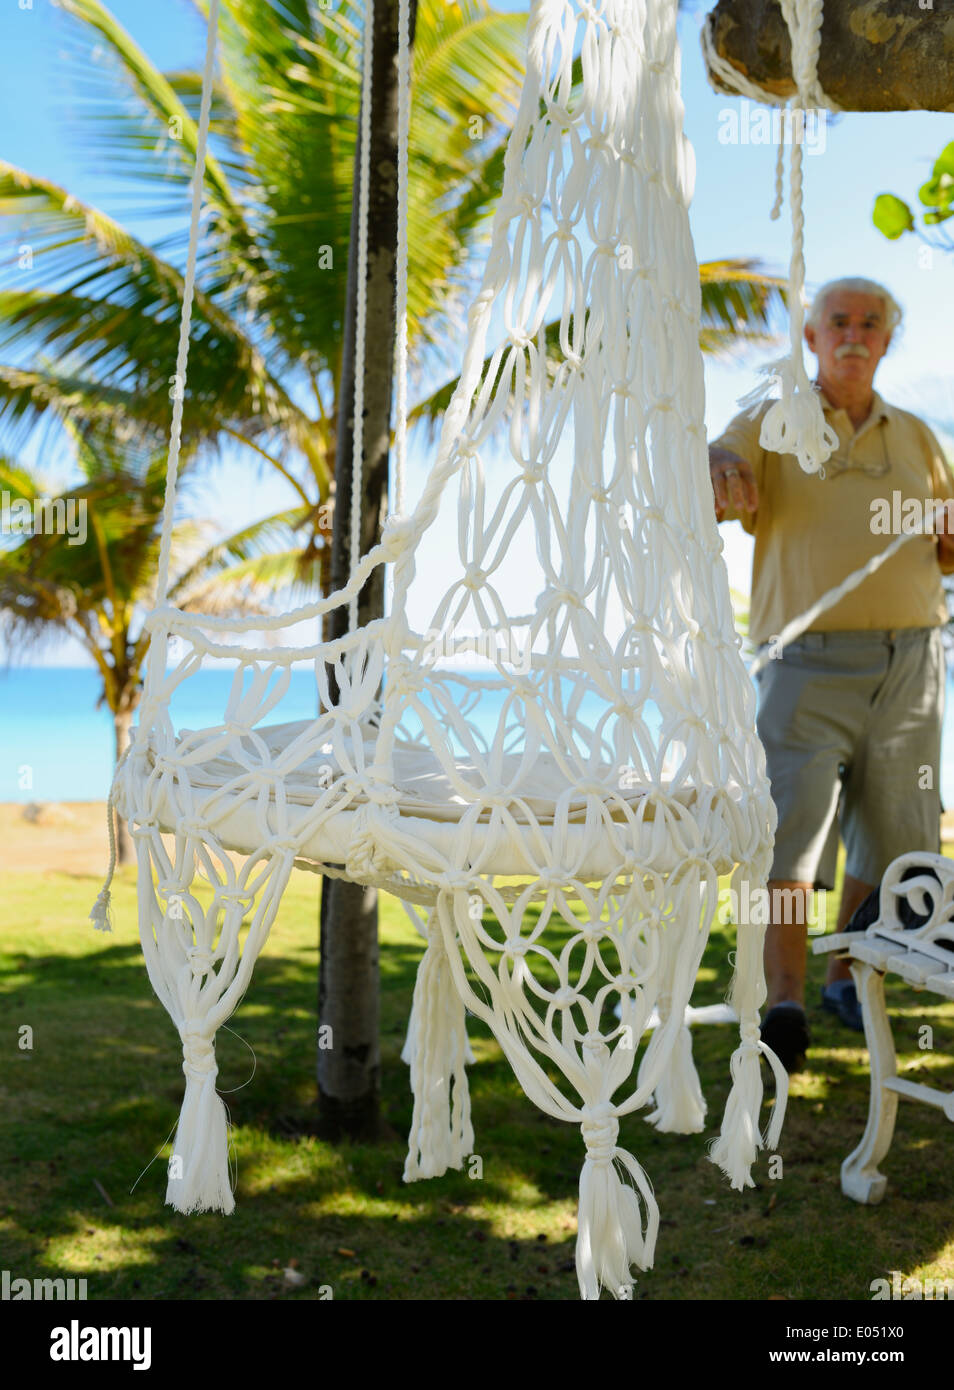 Cuban craftsman tying new white hammocks by the sea shore in Varadero Cuba vacation resort - Stock Image